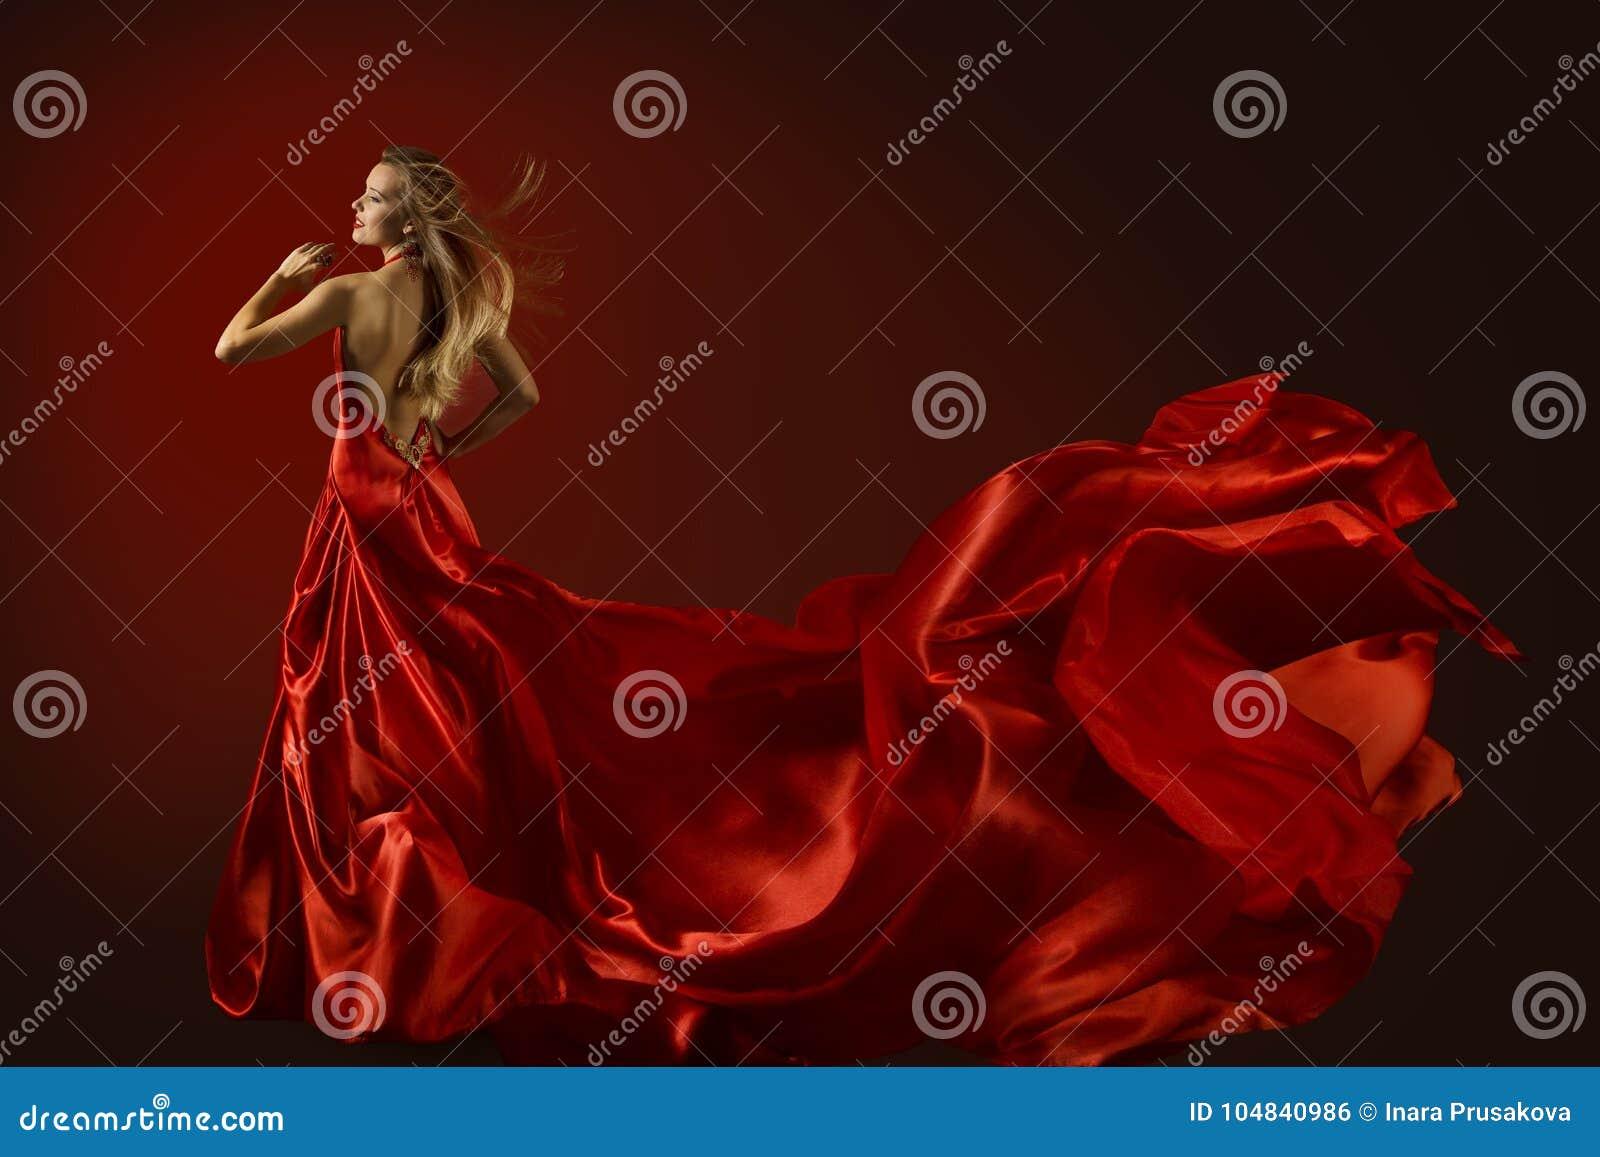 Mannequin Dance in Rode Kleding, Dansende Mooie Vrouw